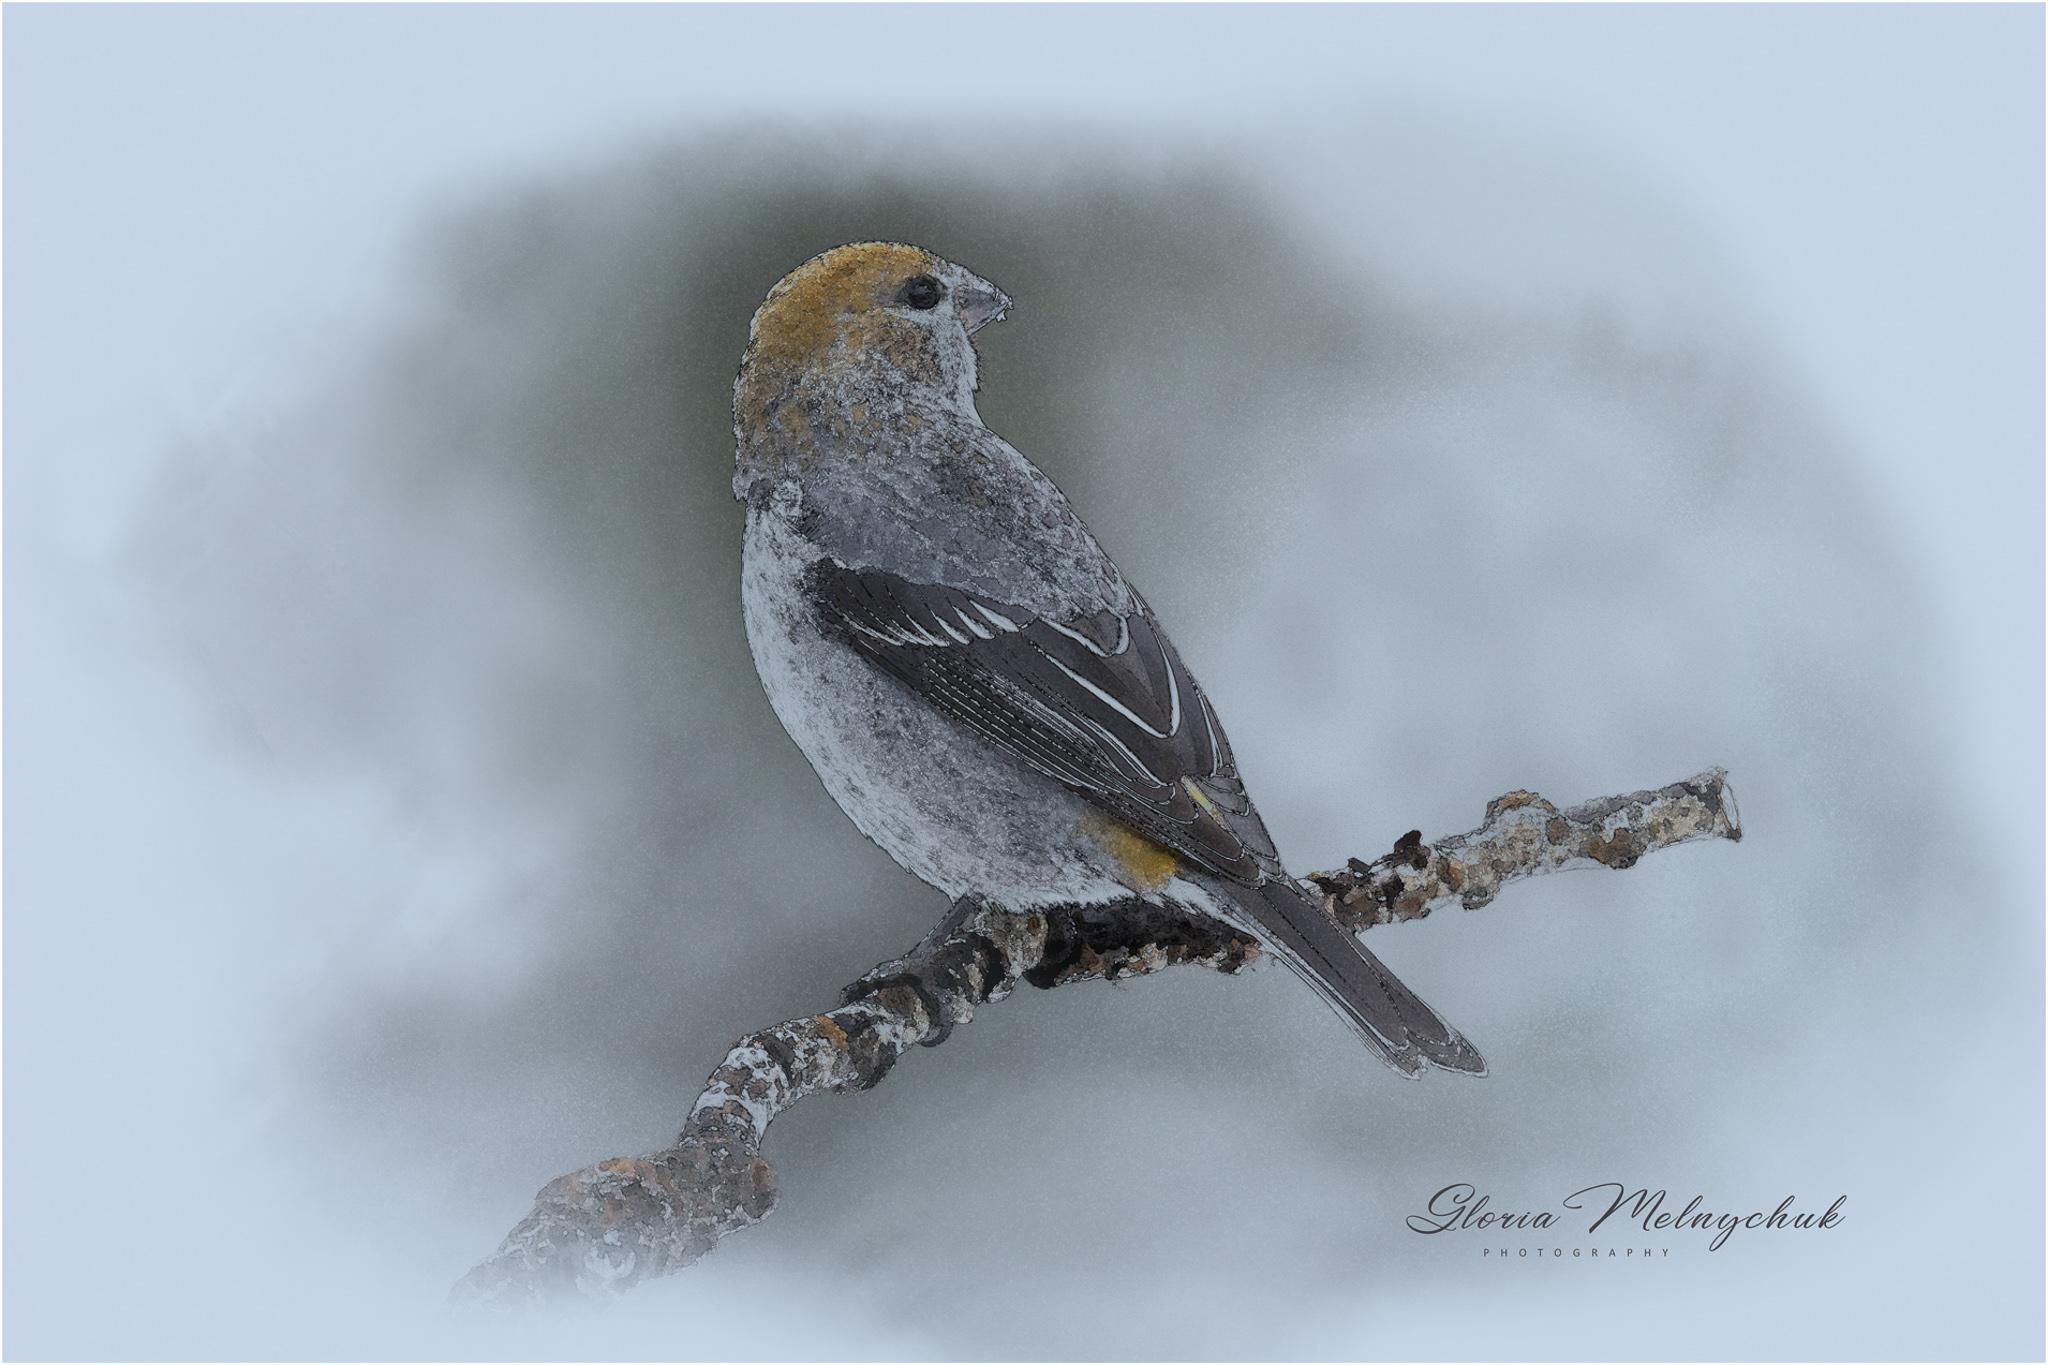 Pine Grosbeak Watercolor © Gloria Melnychuk